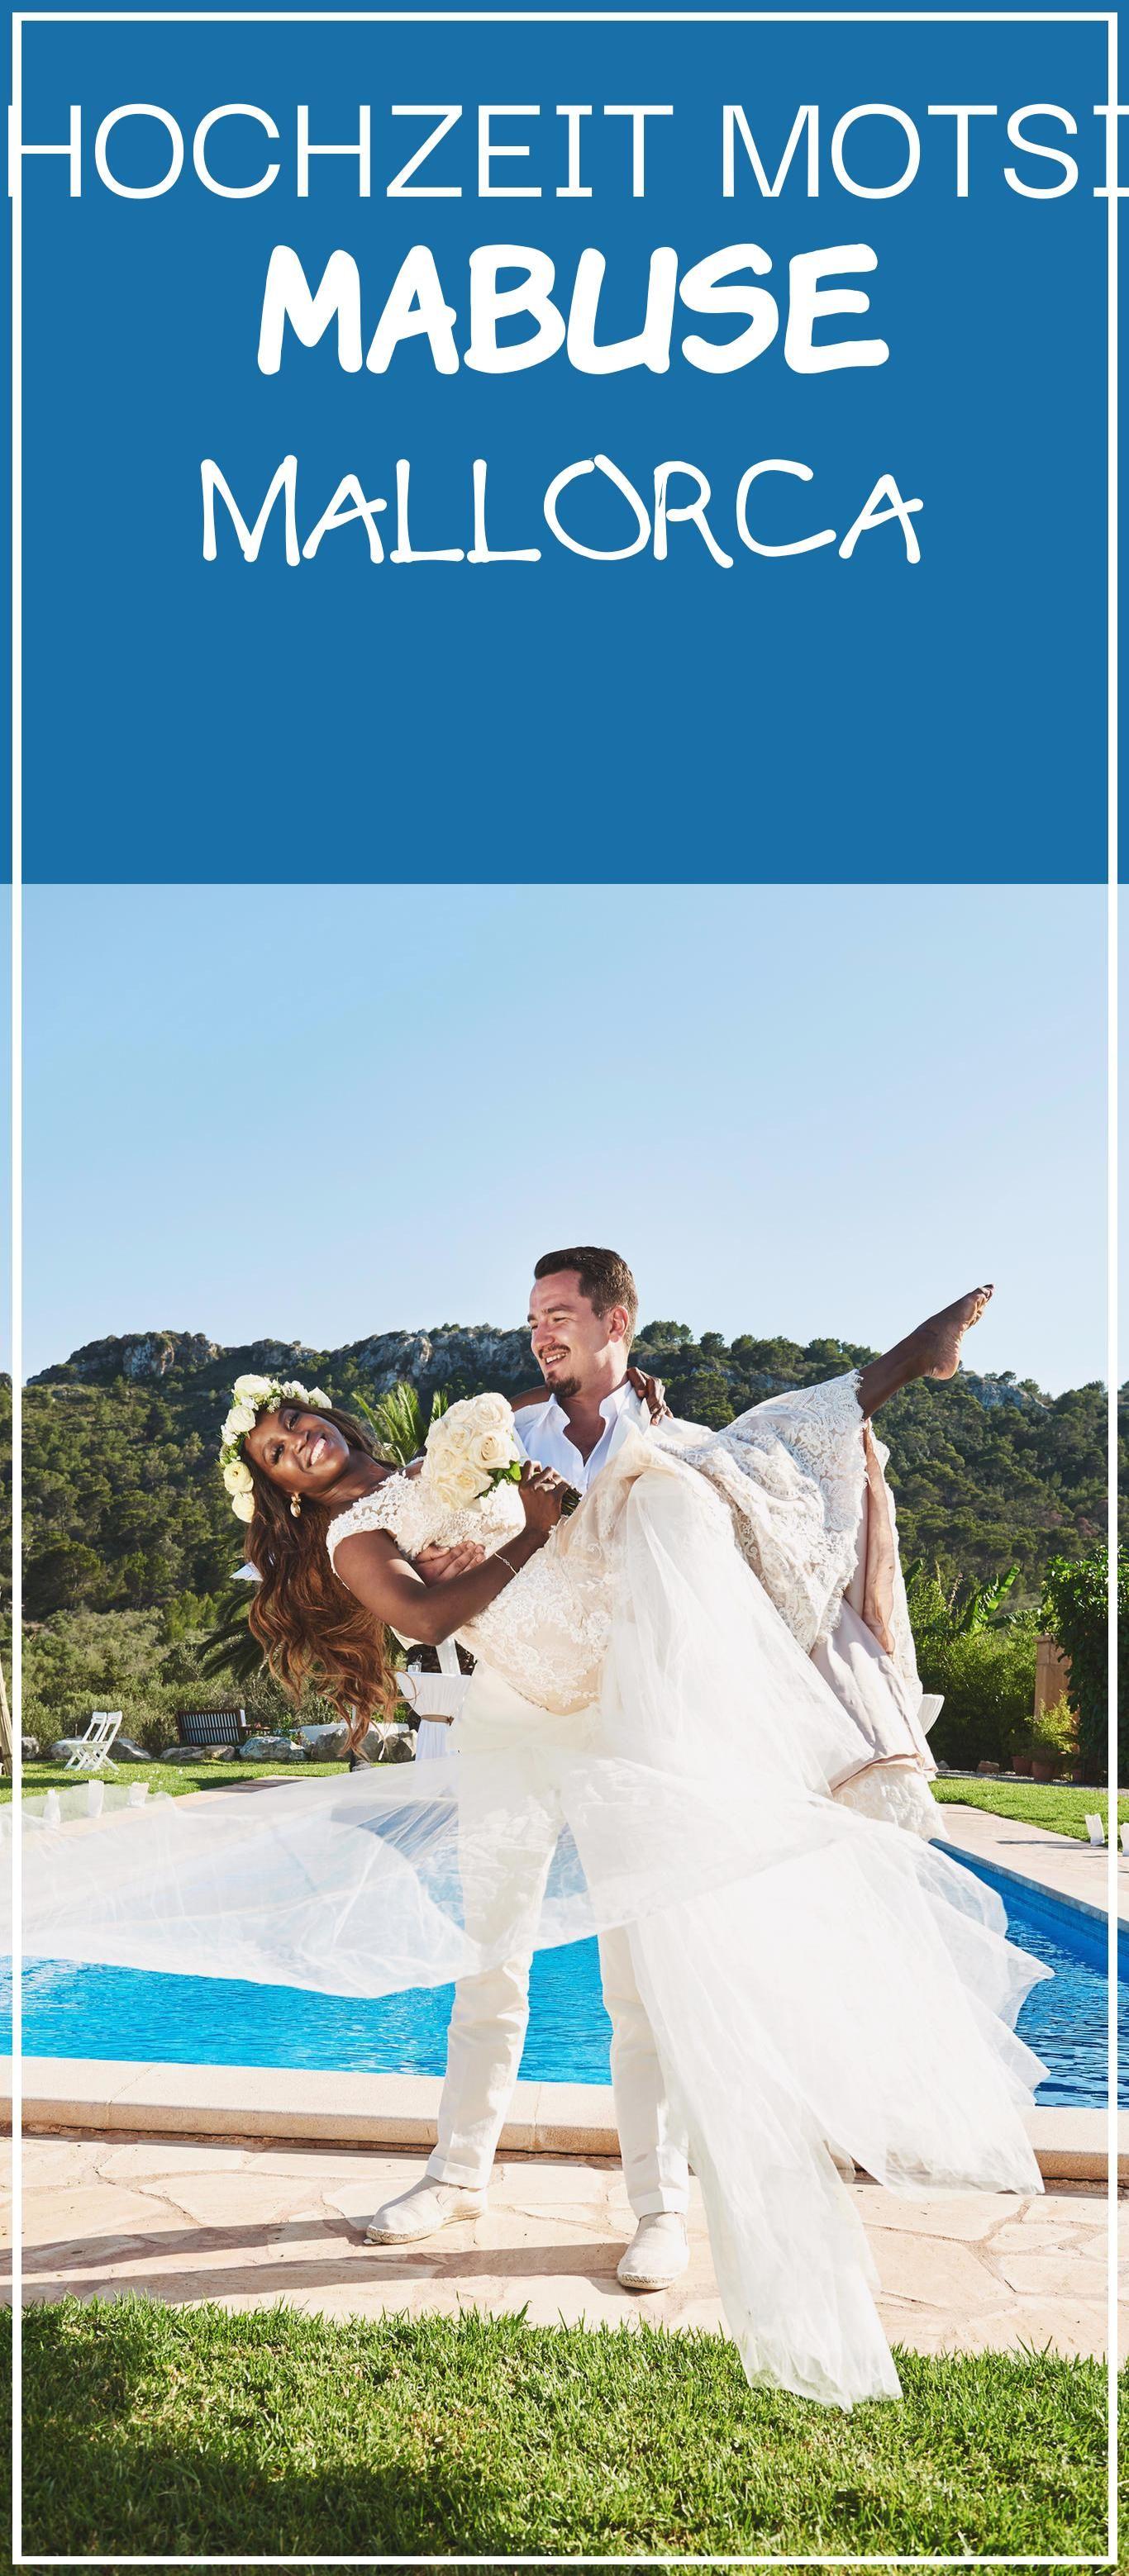 Good 10 Hochzeit Motsi Mabuse Mallorca